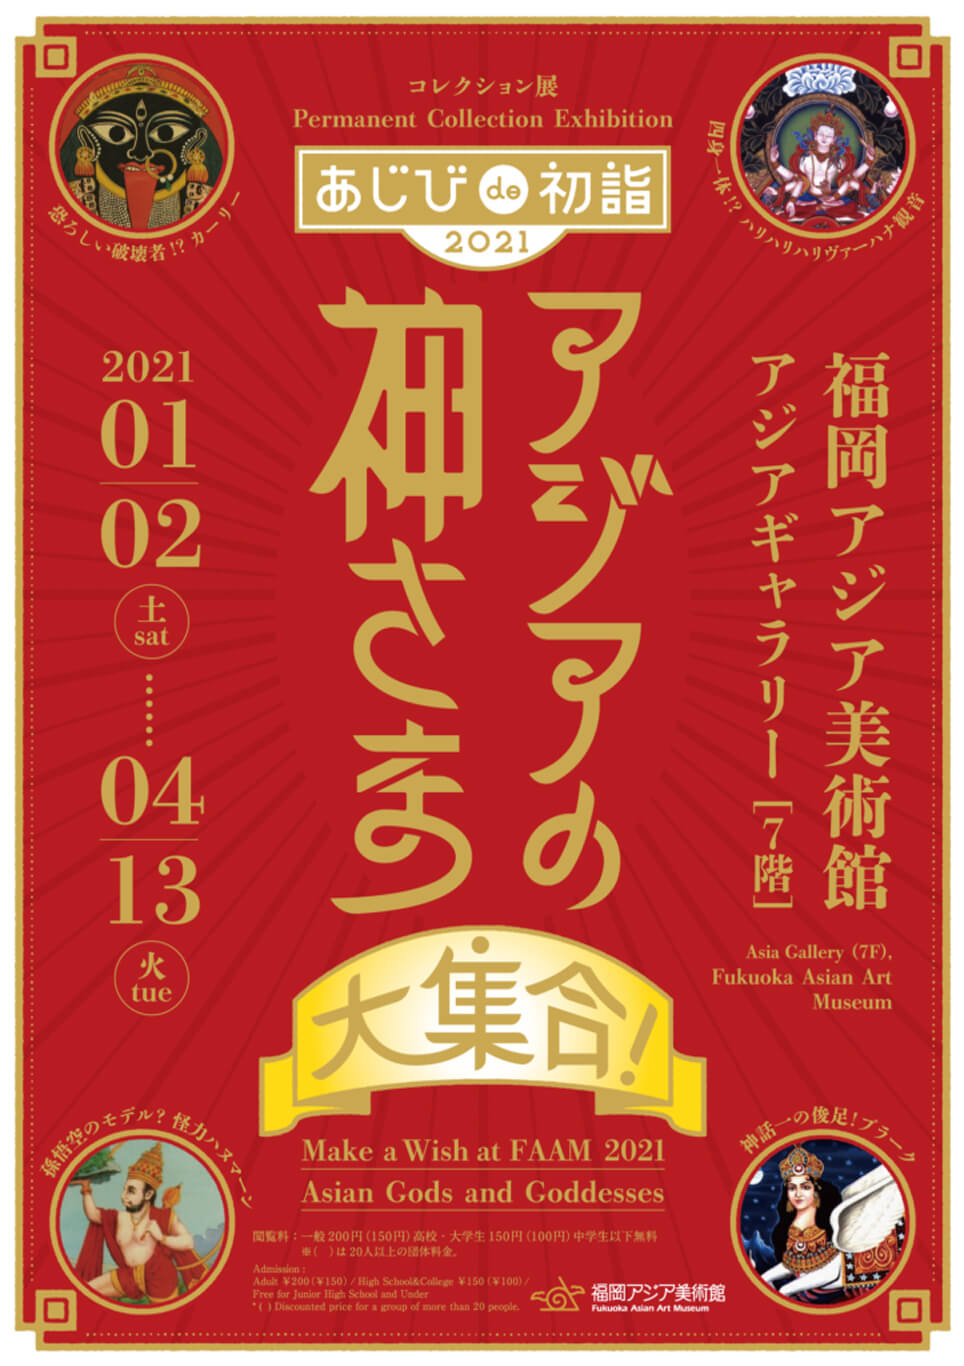 faam-202101-あじびde初詣2021~アジアの神さま大集合!